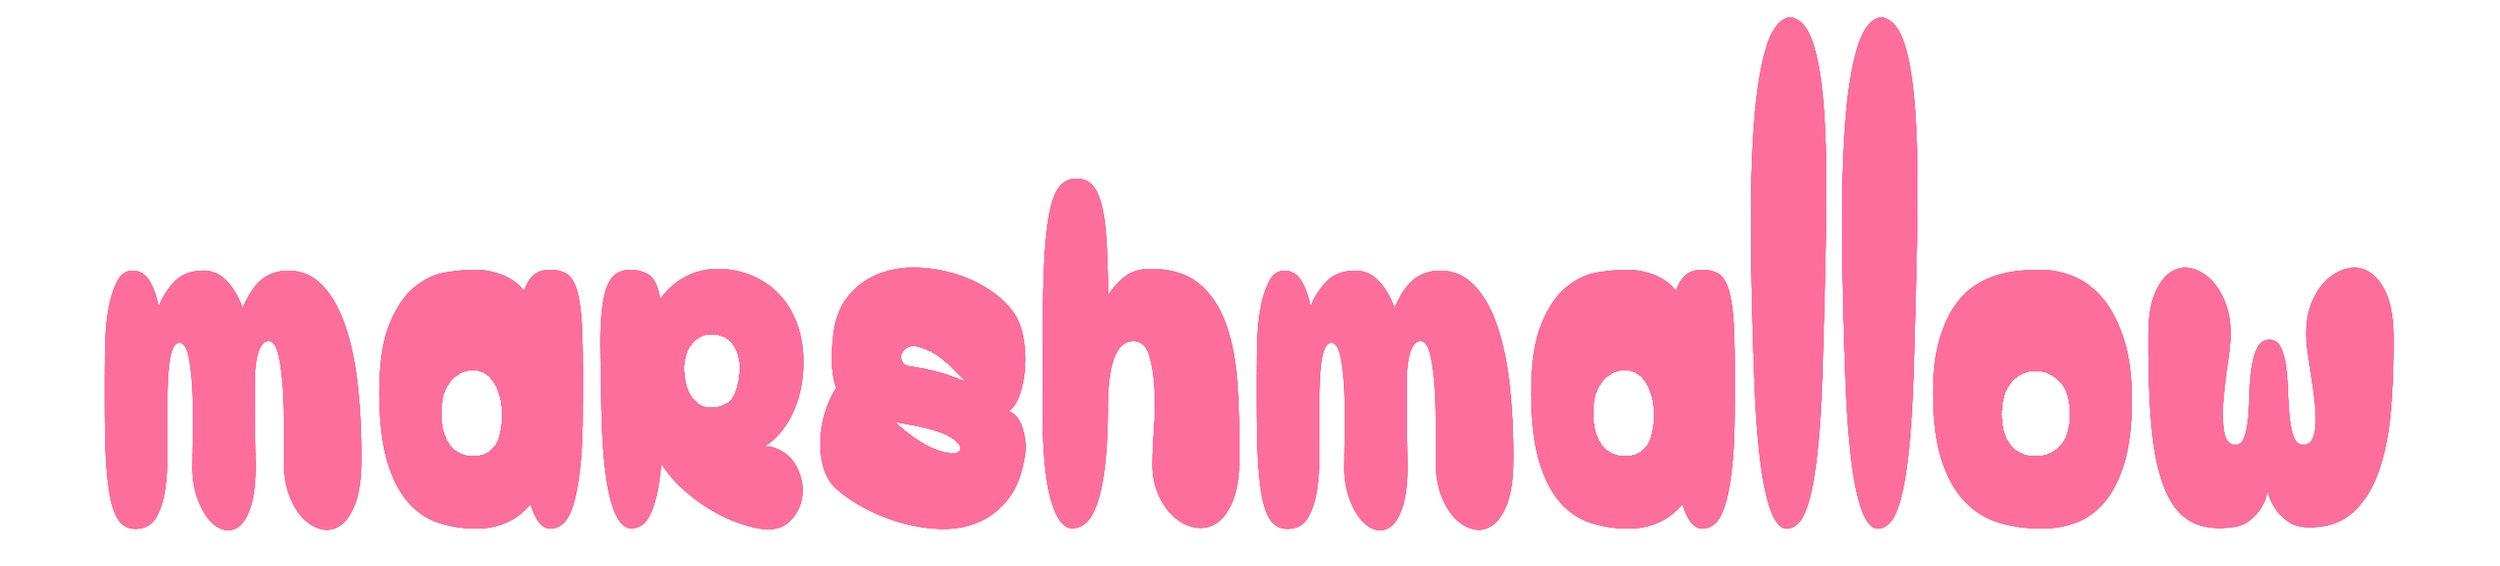 marshmallow logo copy_pink.jpg